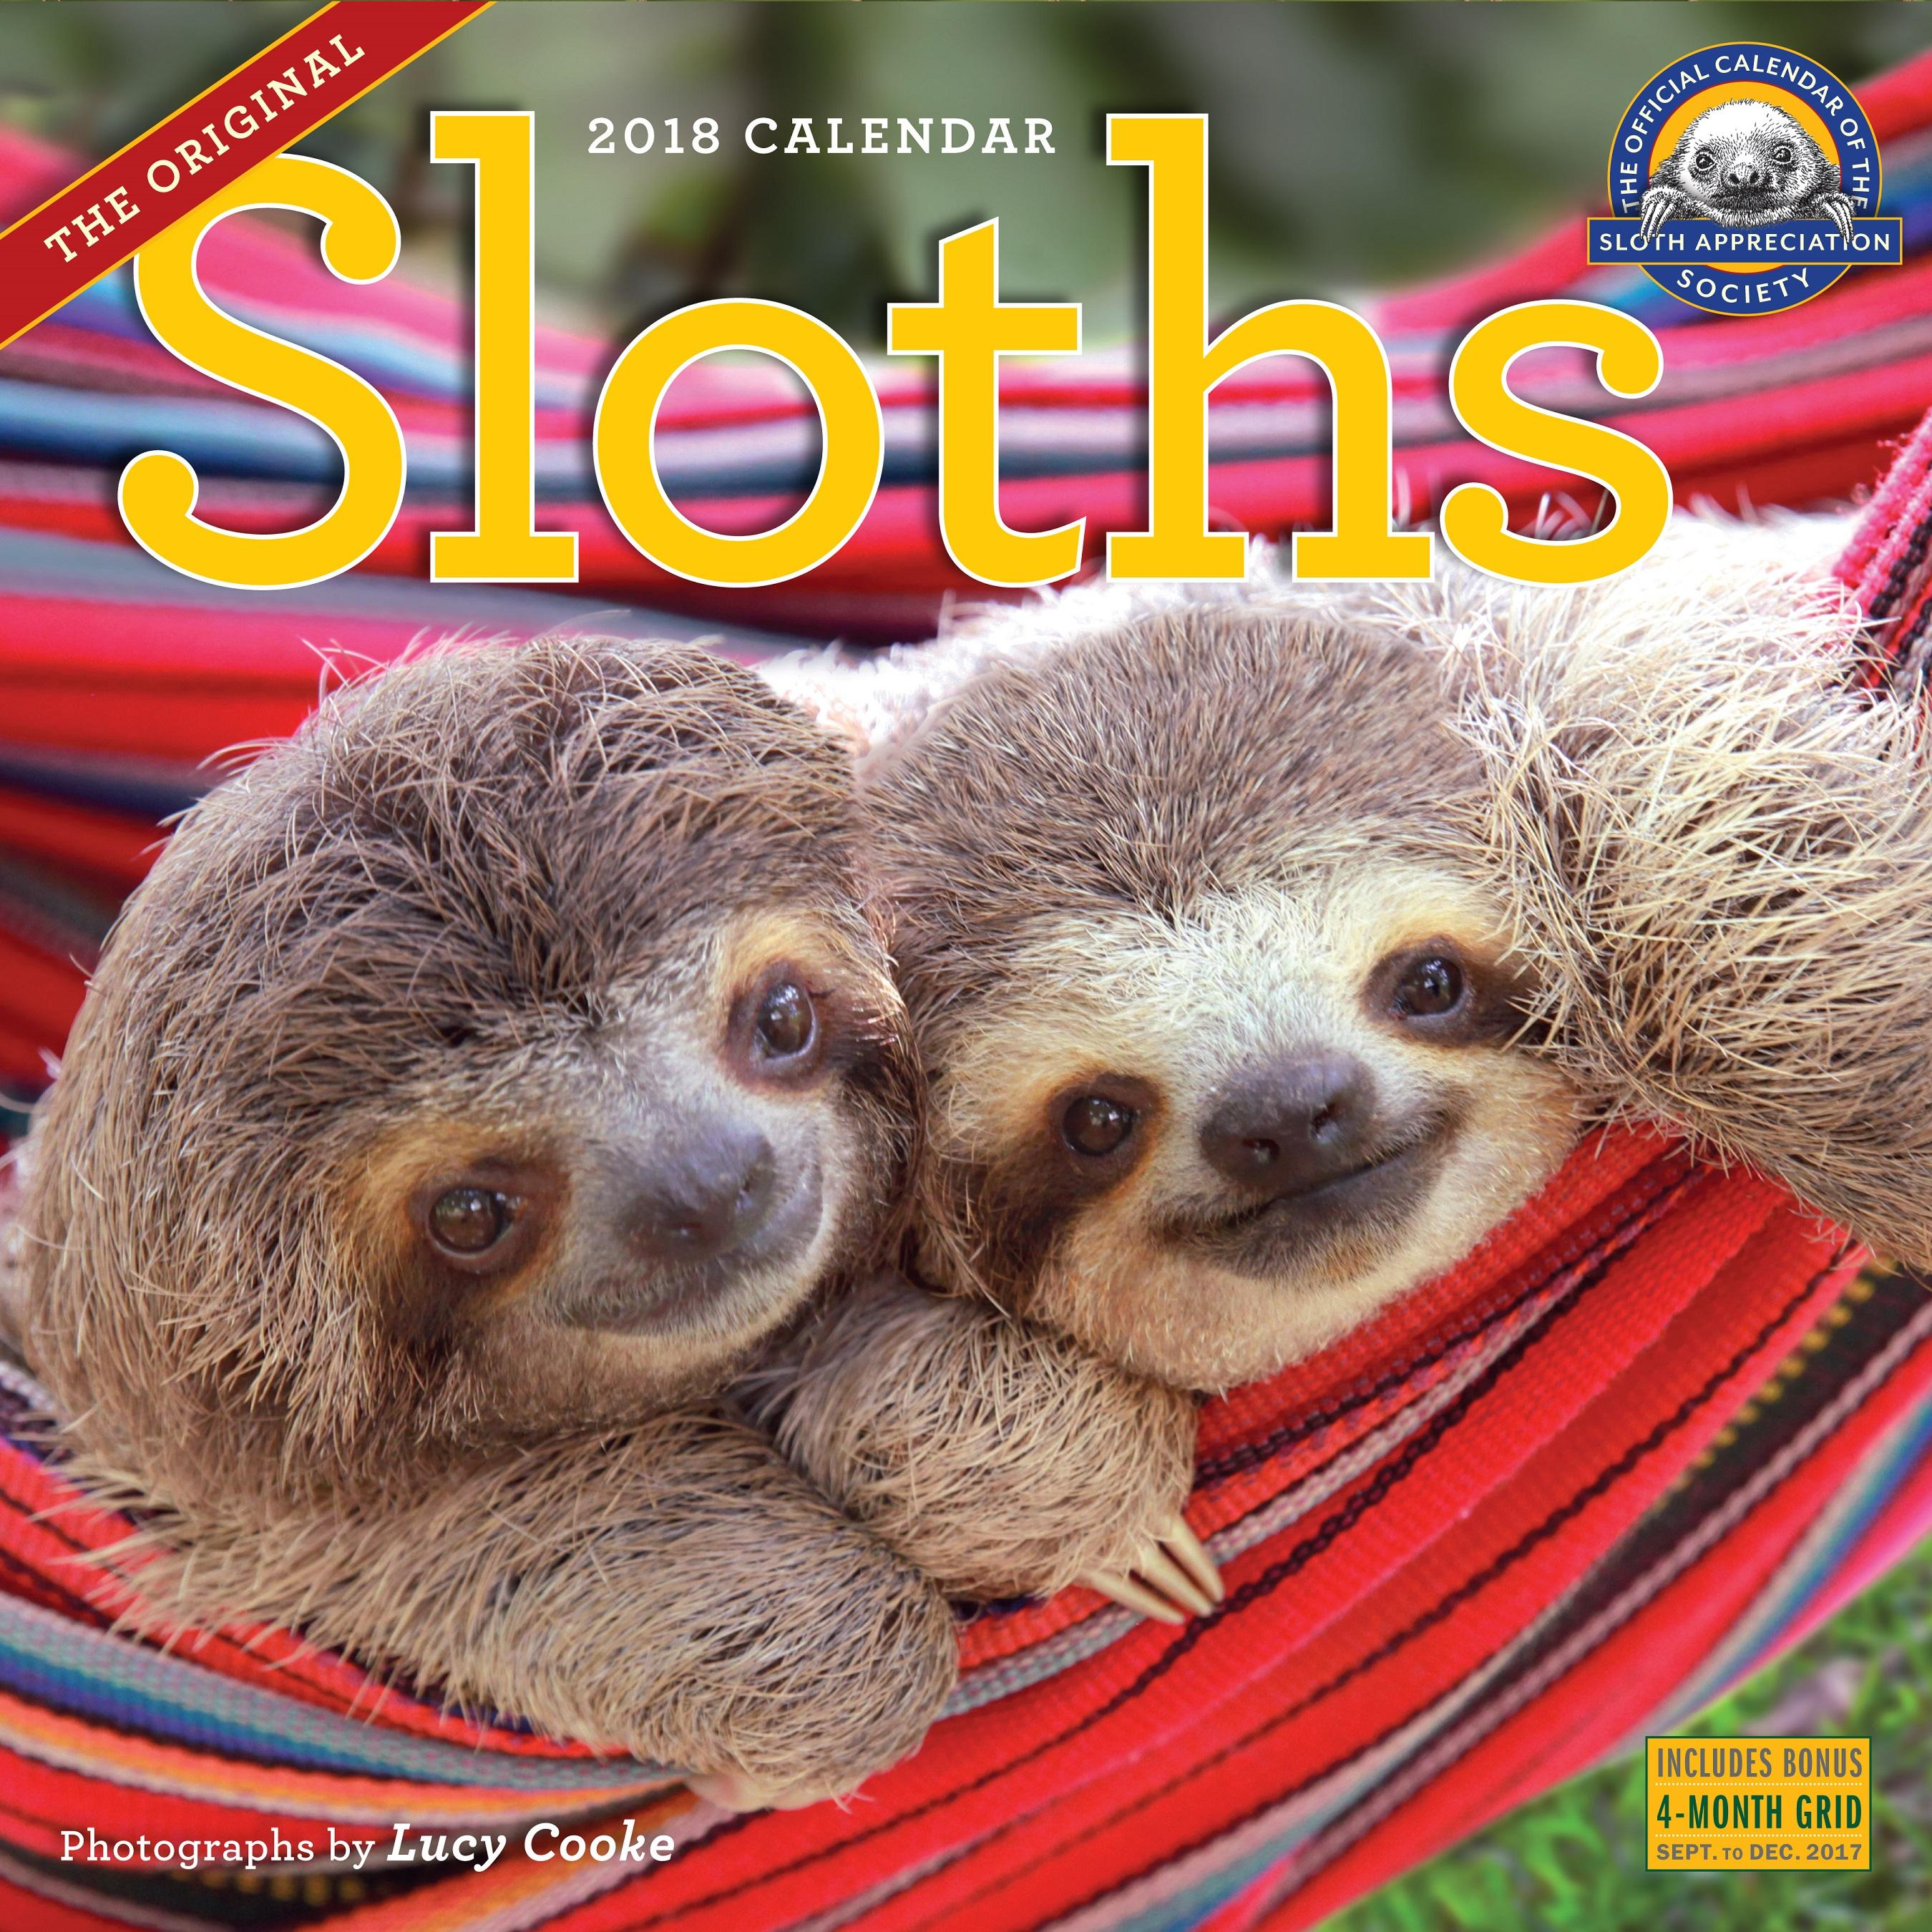 Amazon.com: Sloths Wall Calendar 2018 (9780761193364): Lucy ...